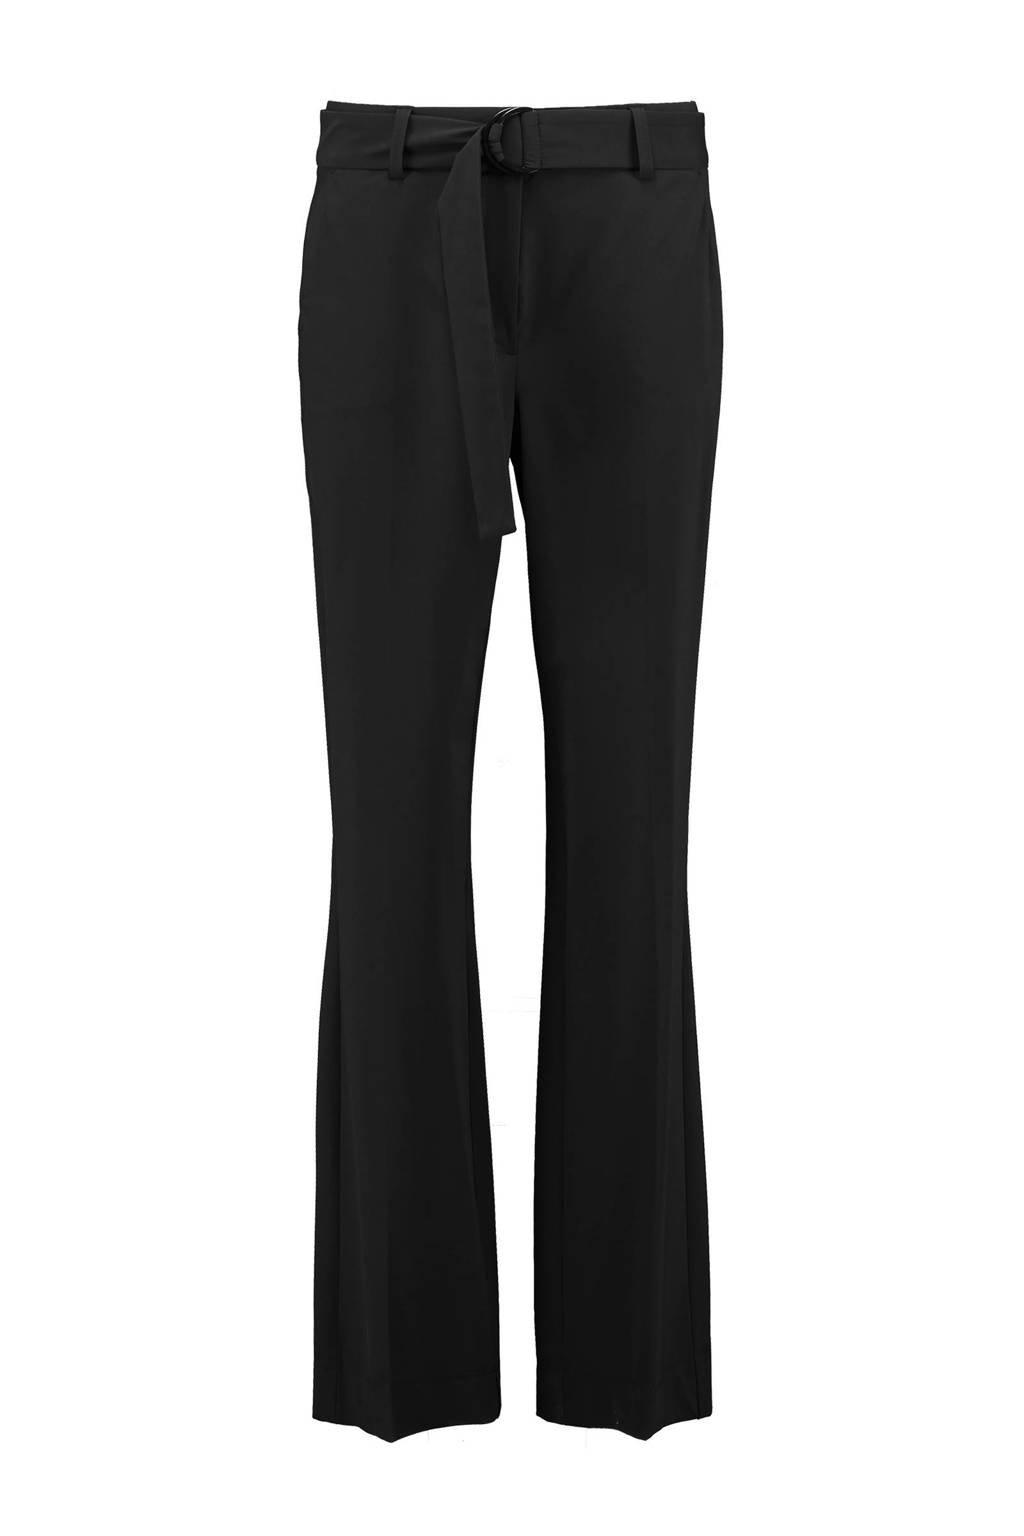 Expresso loose fit pantalon zwart, Zwart